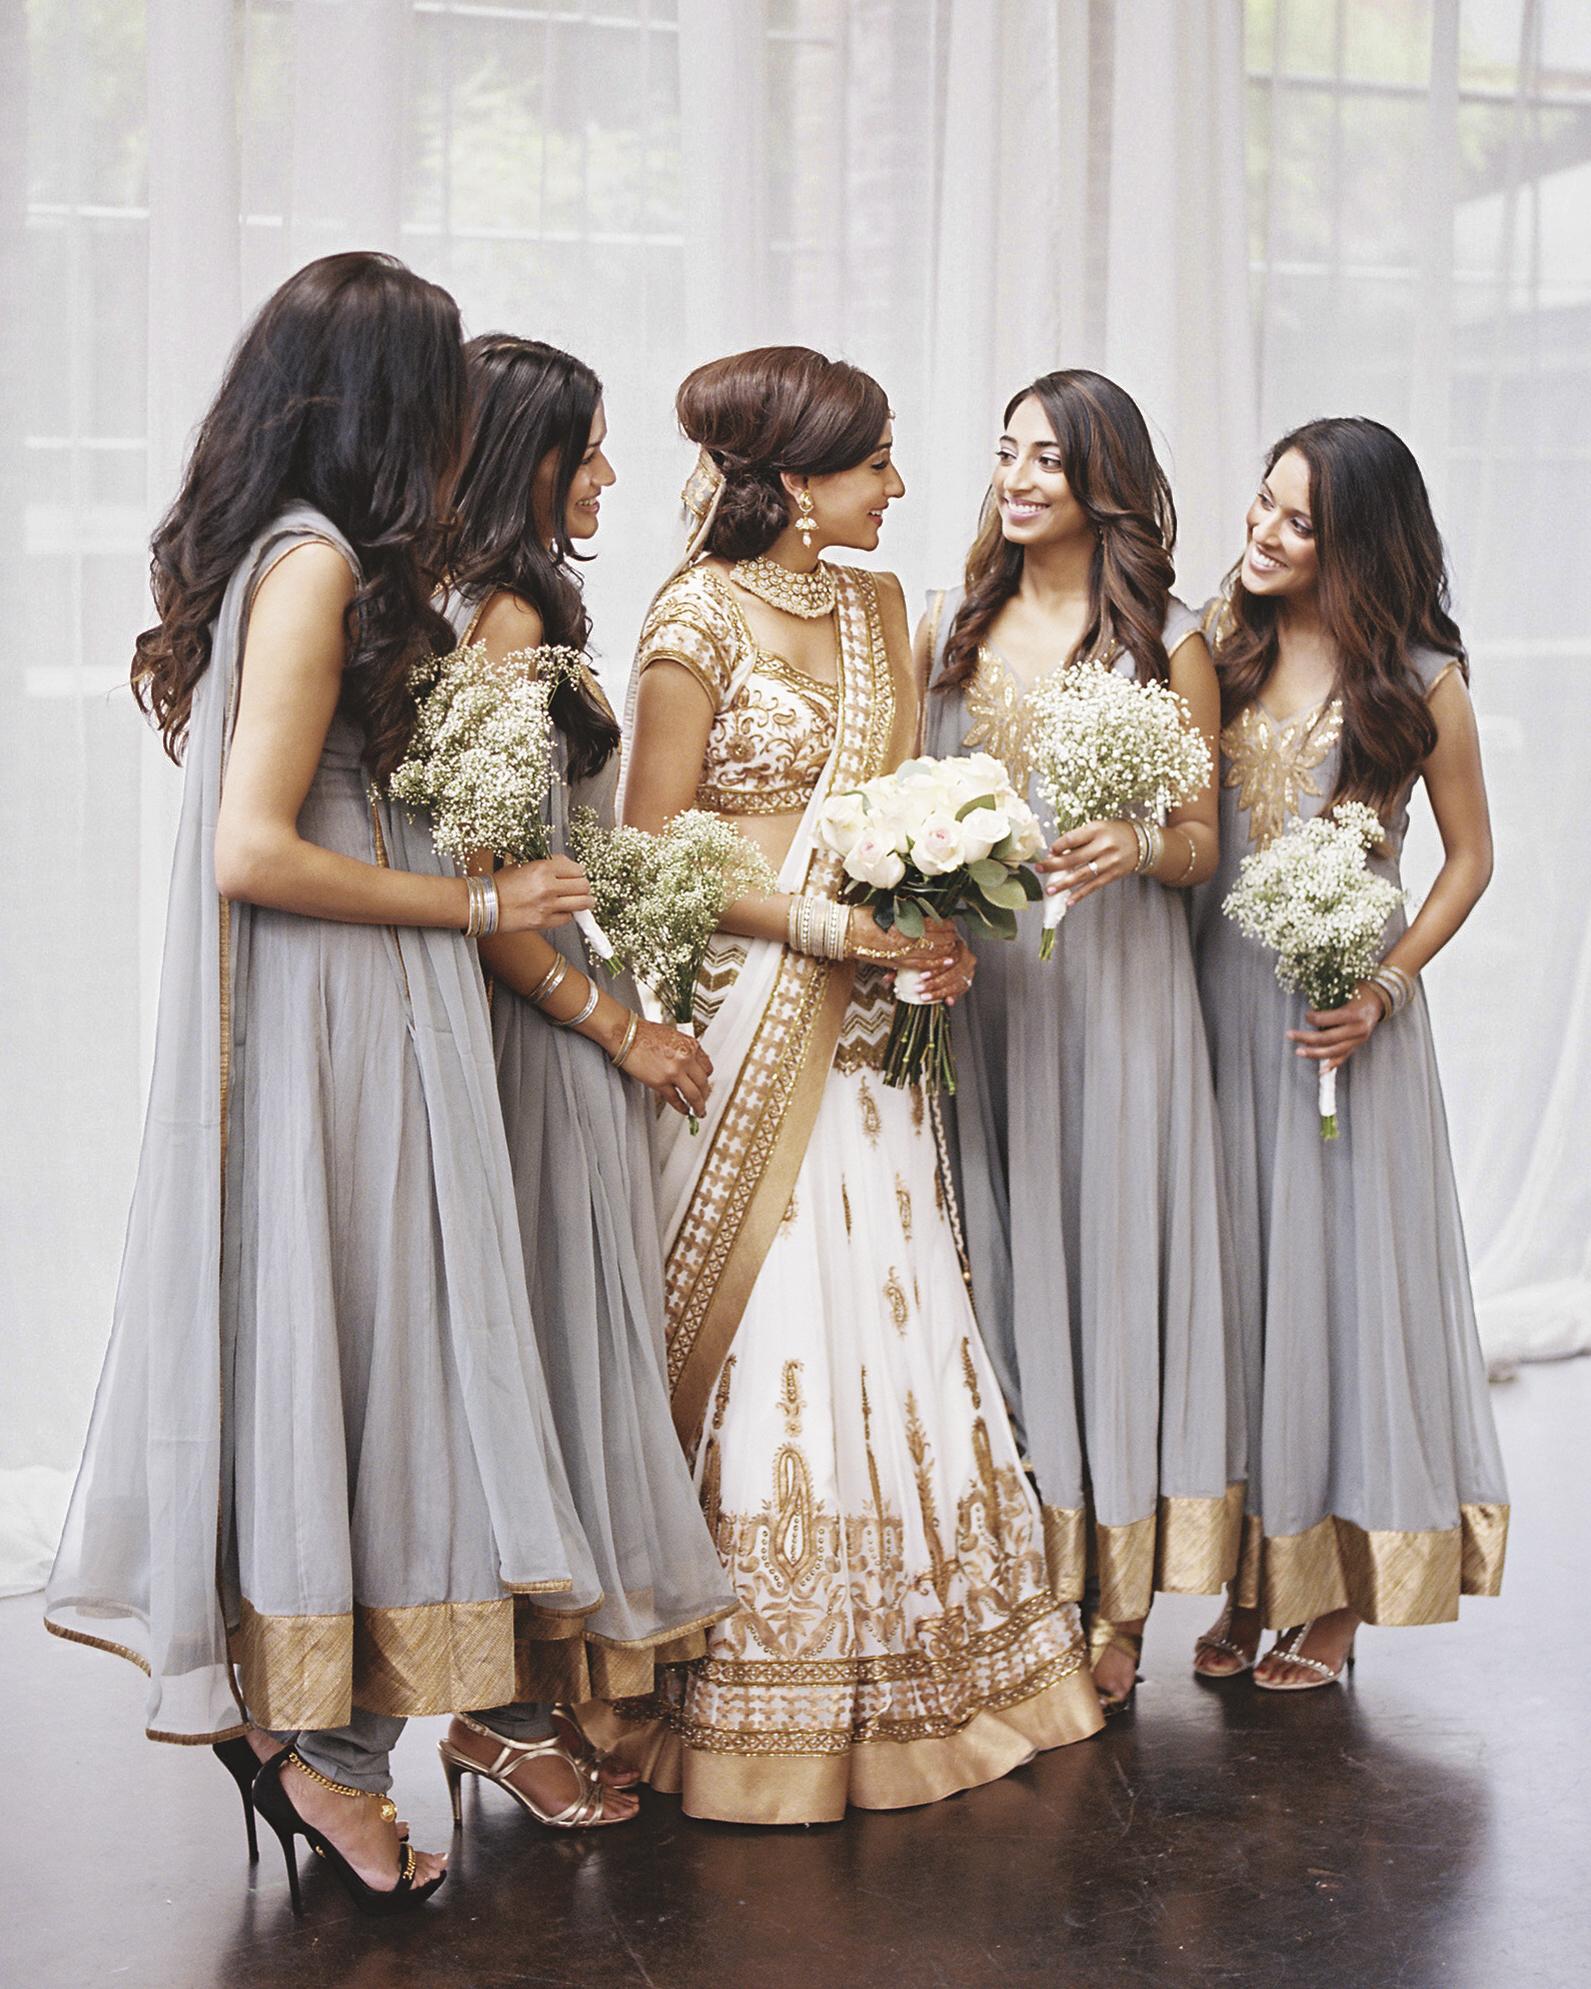 sejal-narayana-wedding-georgia-359-s111893.jpg